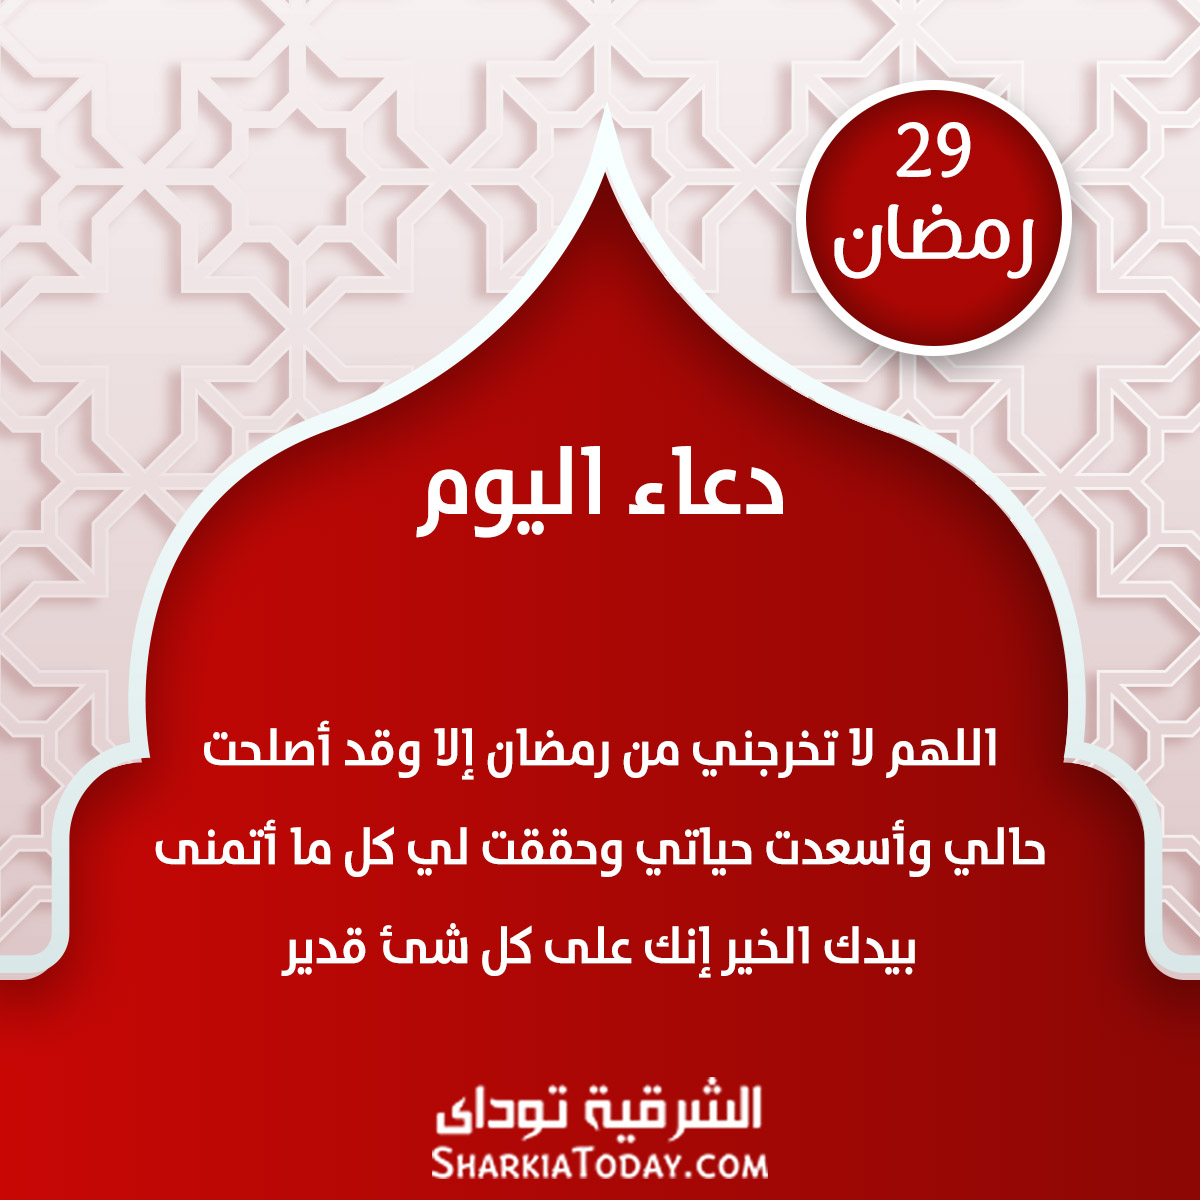 صورة دعاء 29 رمضان